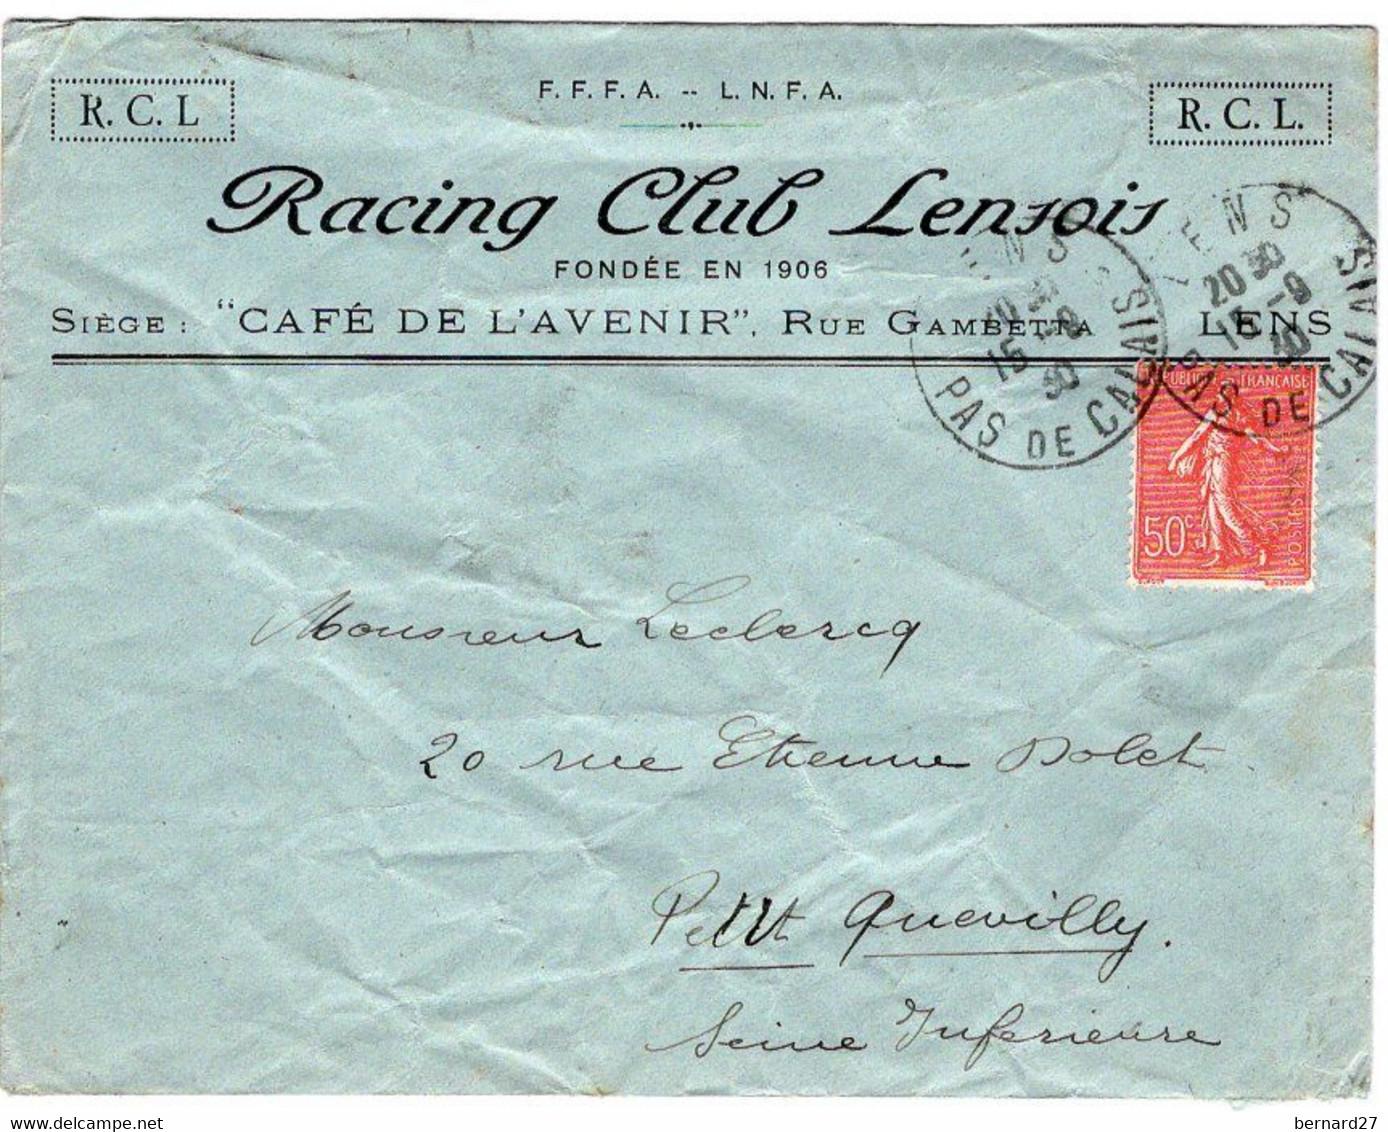 ENVELOPPE RACING CLUB LENSOIS - LENS - Zonder Classificatie